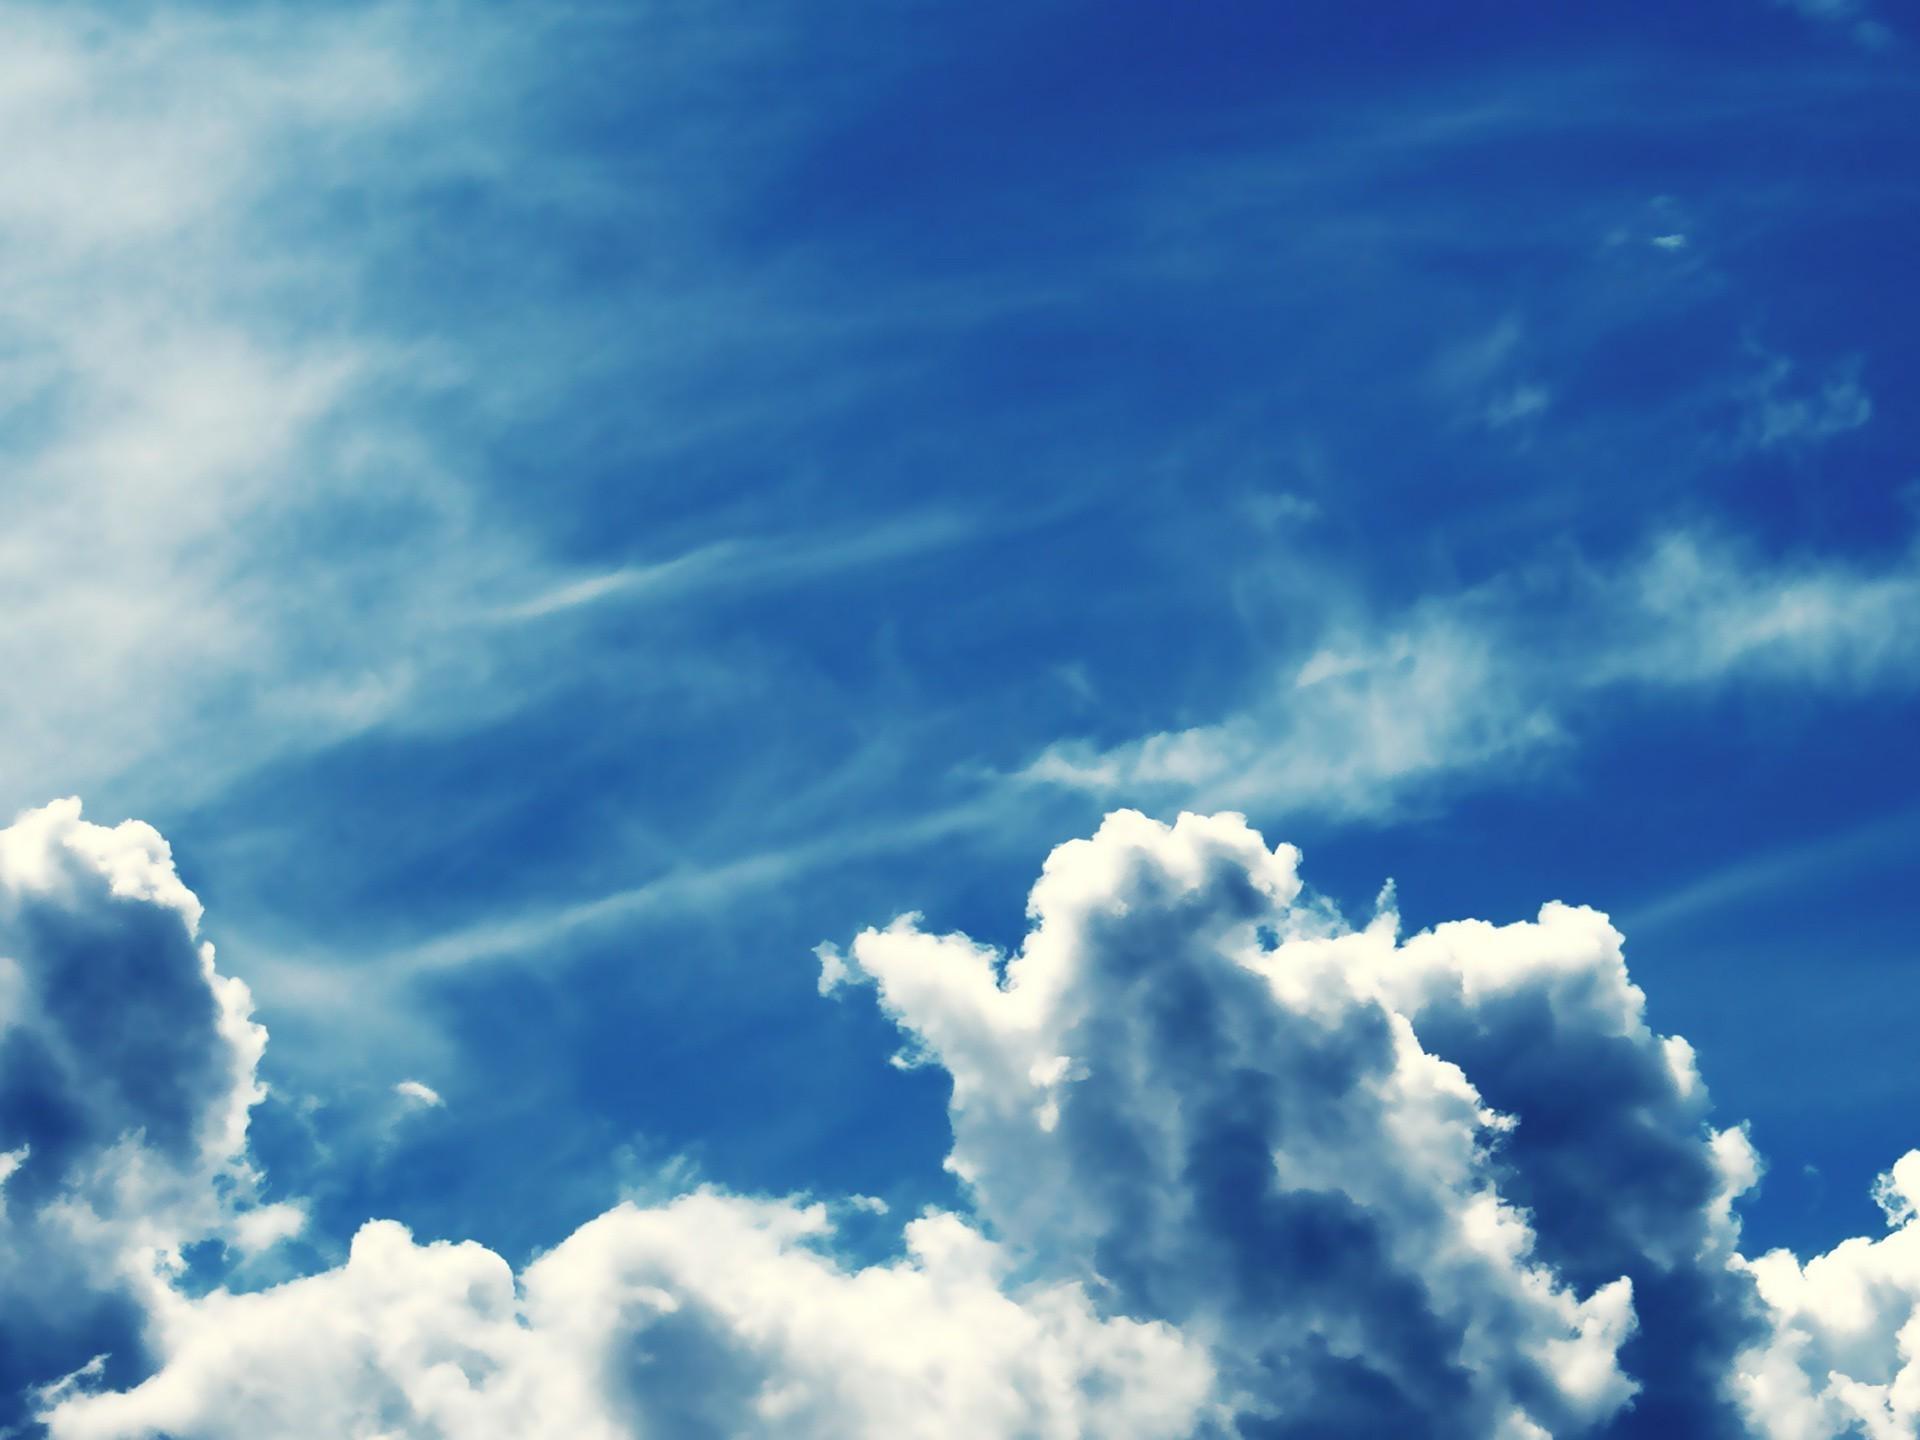 sky, Clouds Wallpaper HD